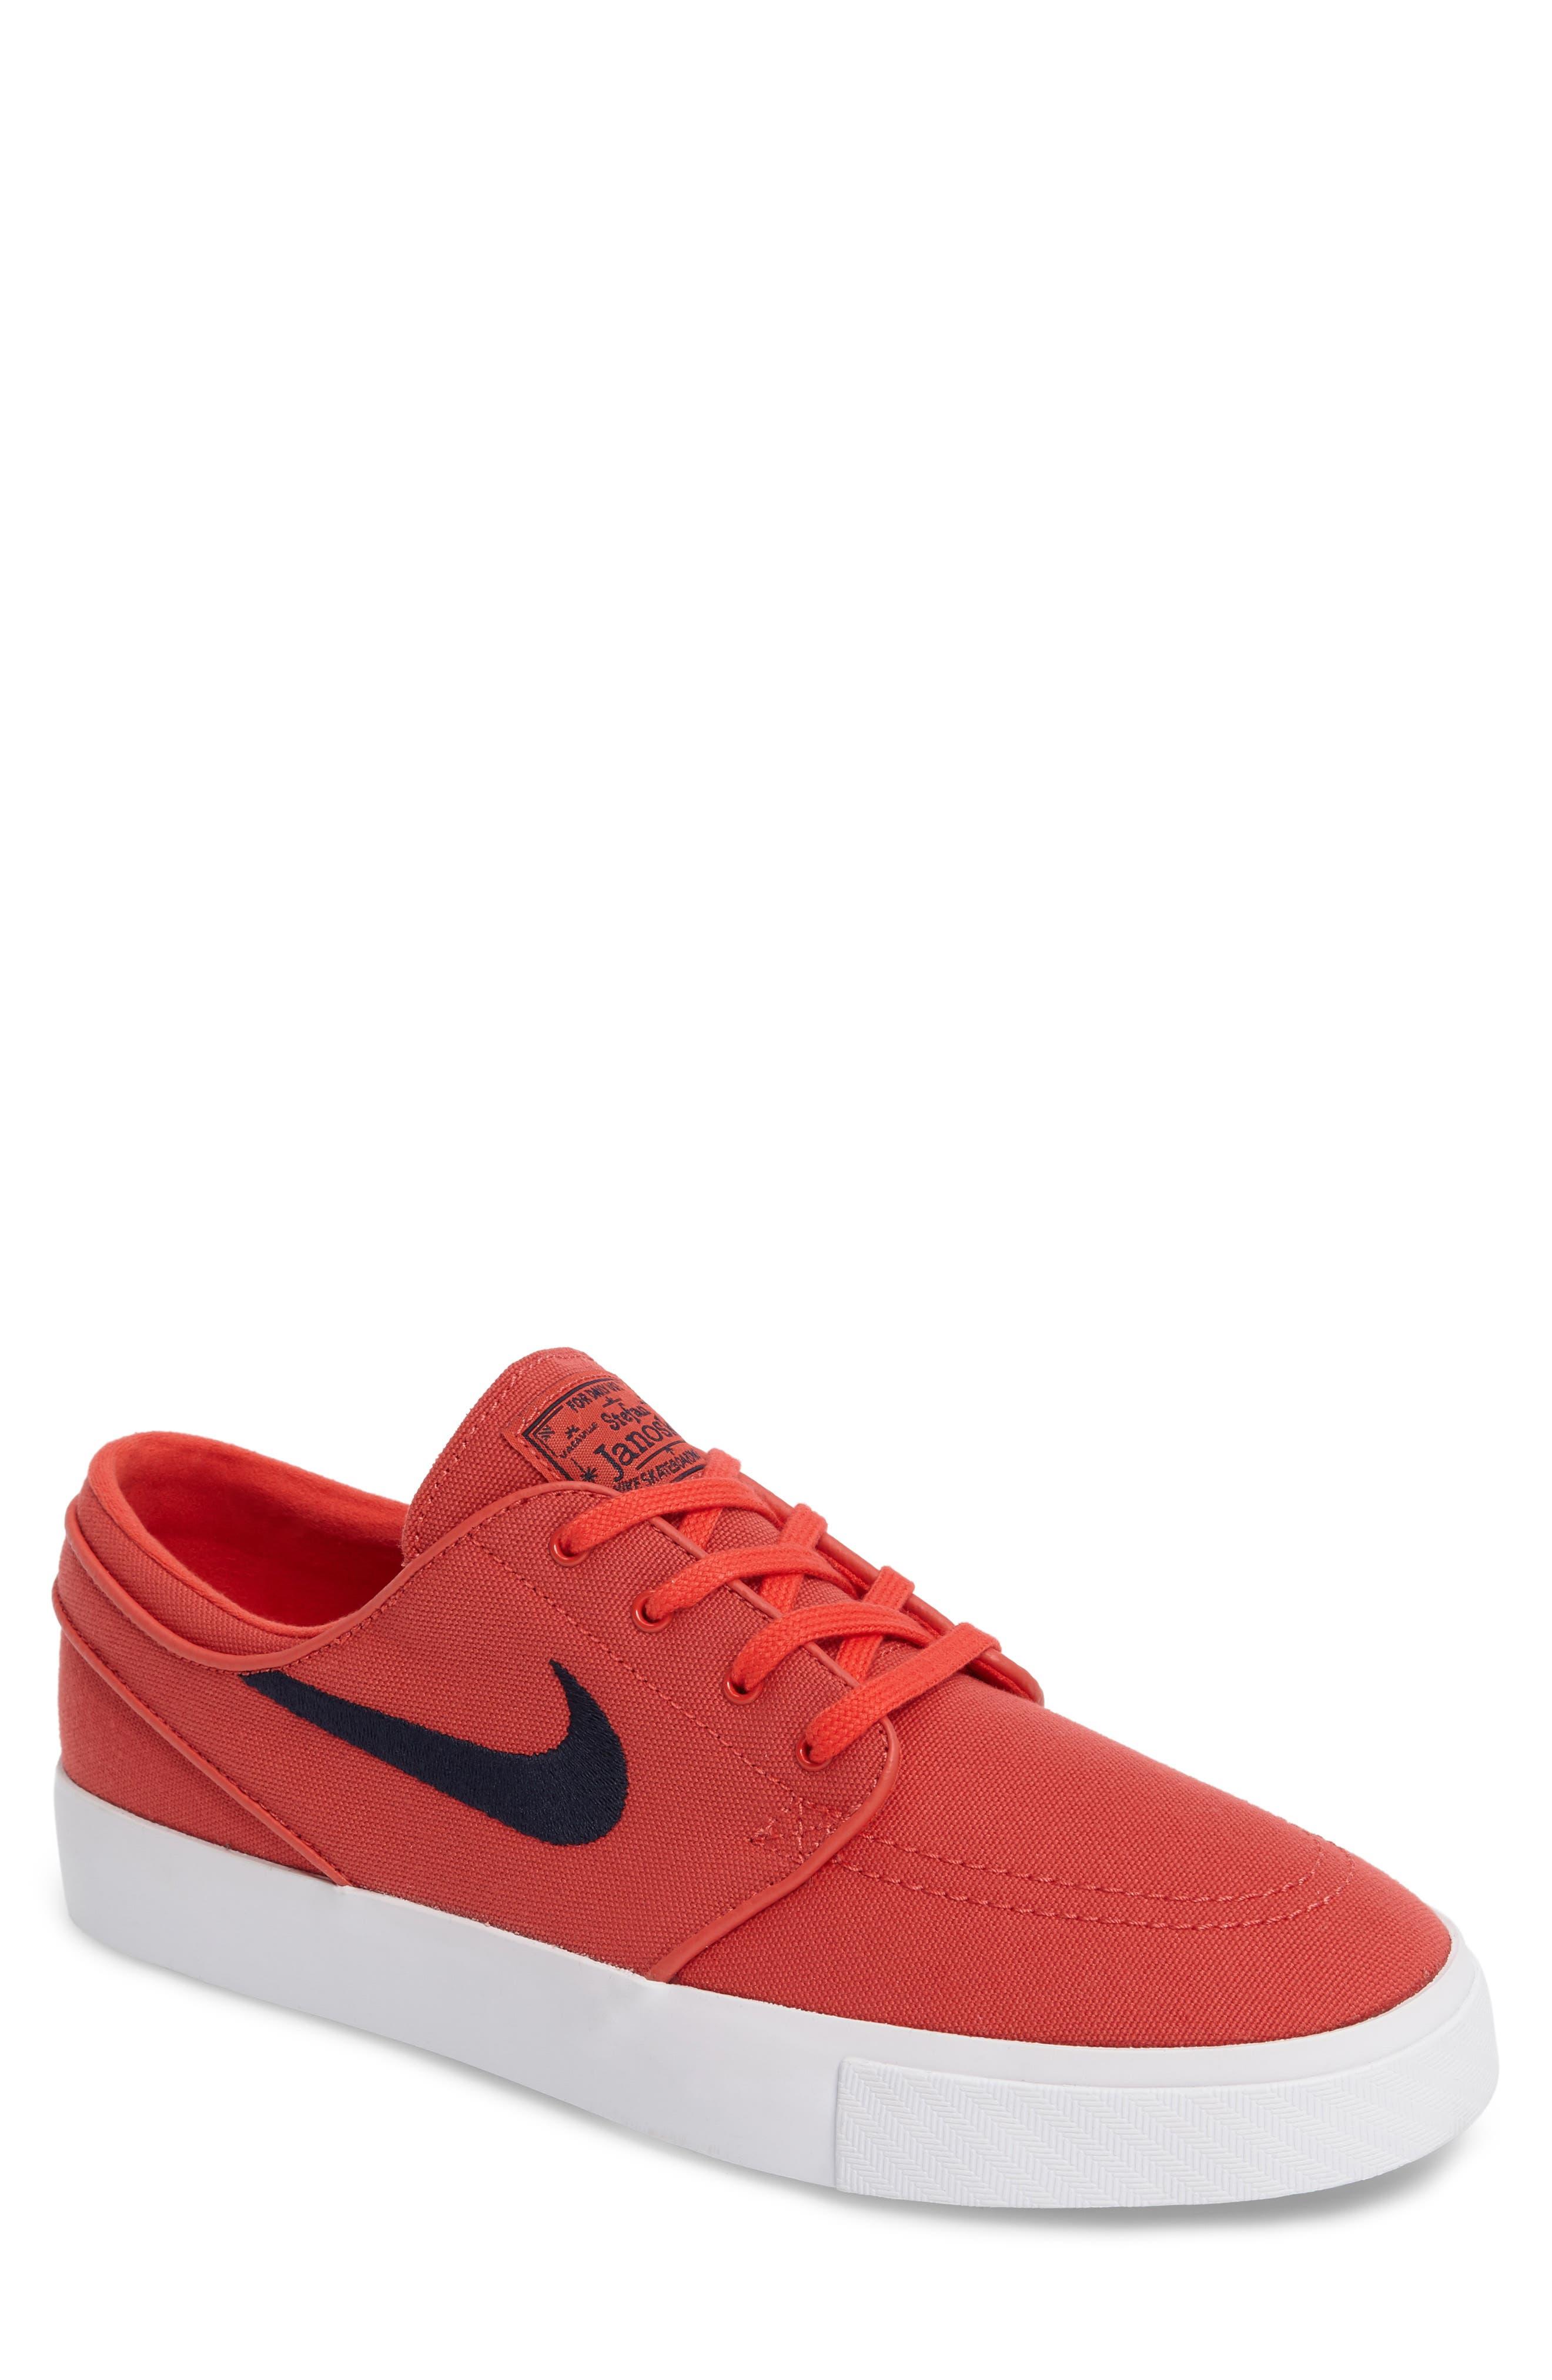 Alternate Image 1 Selected - Nike 'Zoom - Stefan Janoski SB' Canvas Skate Shoe